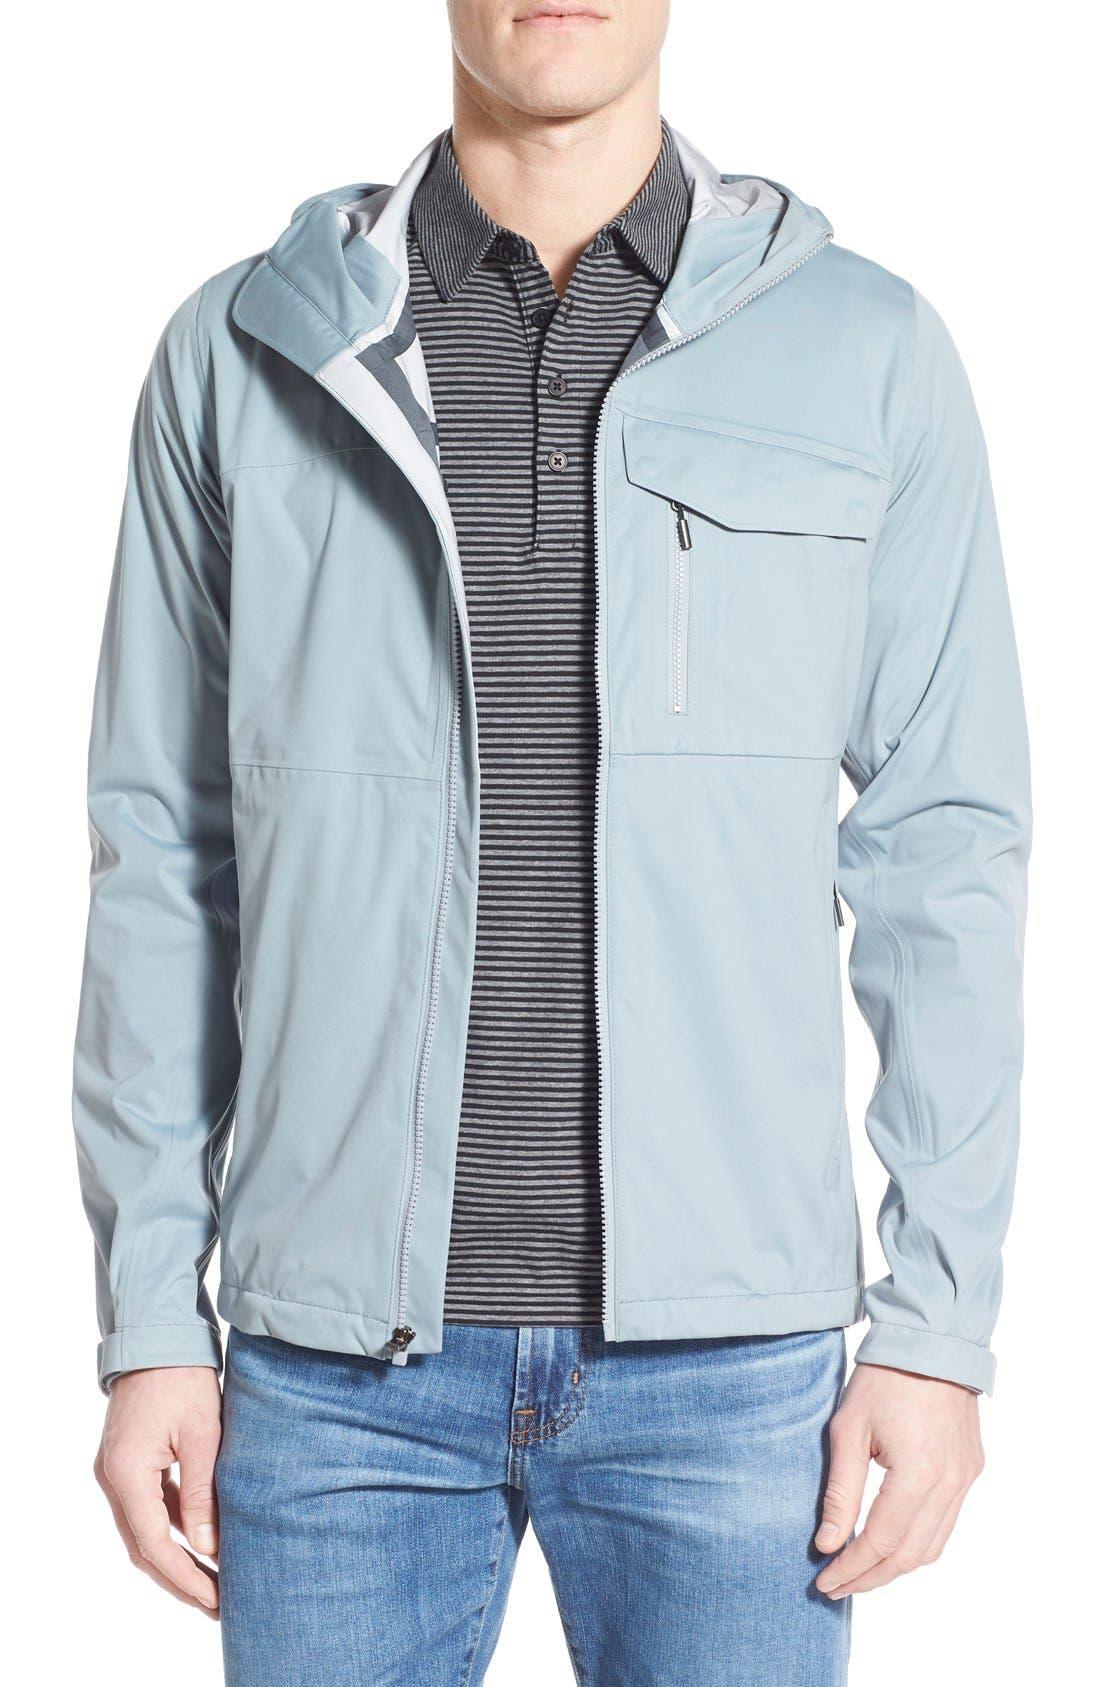 'Rebound' Regular Fit Zip Hooded Jacket,                         Main,                         color, 073